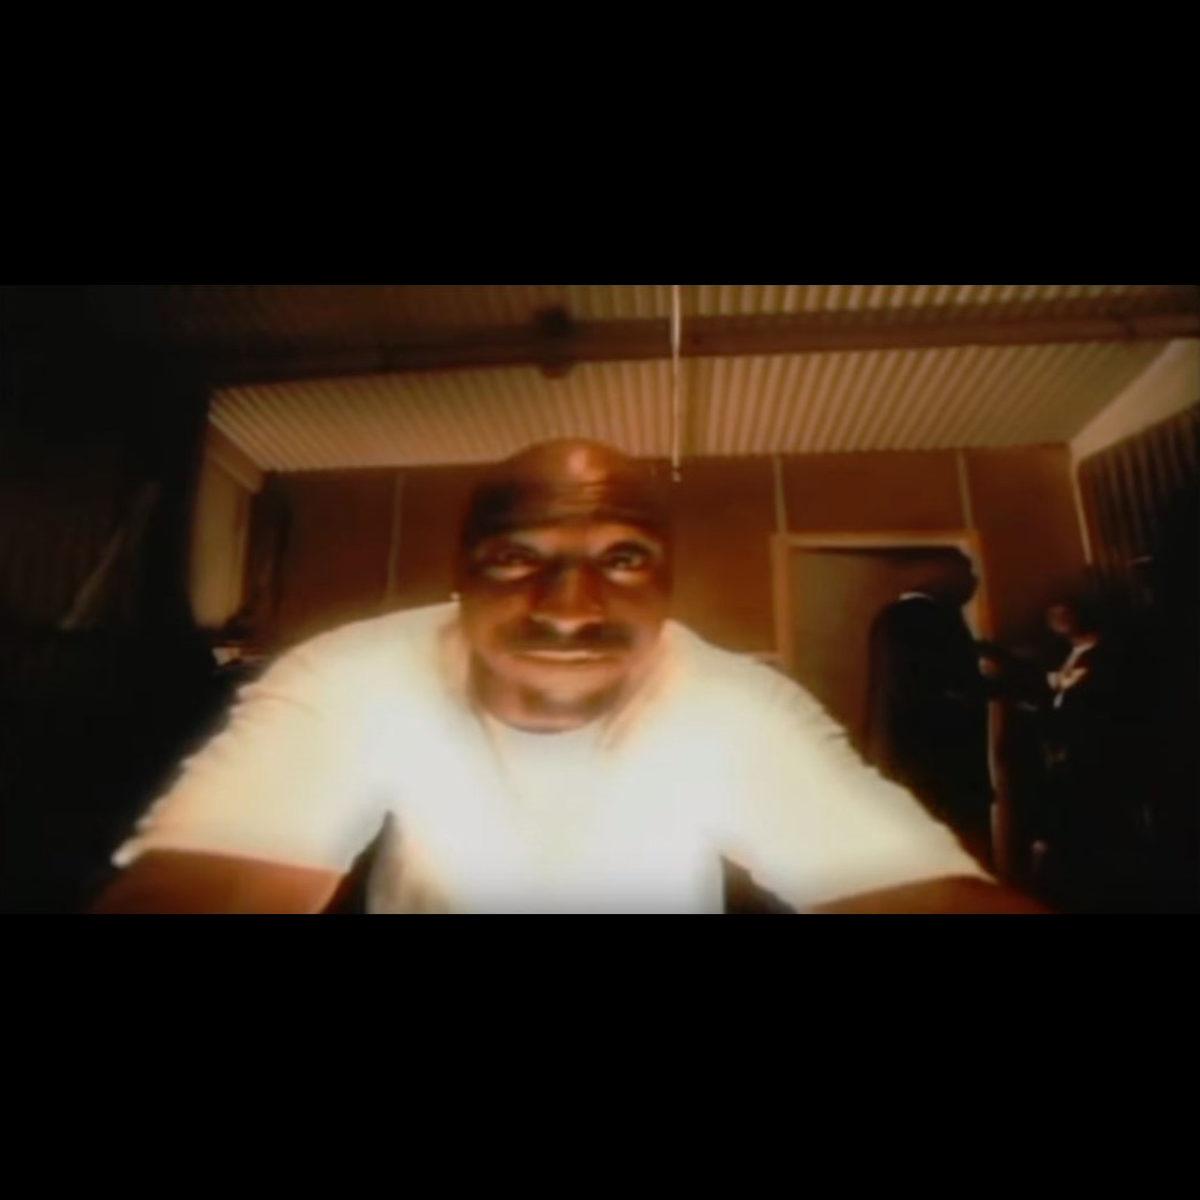 2Pac - Made Niggaz (ft. Outlawz) (360 Camera) (Thumbnail)